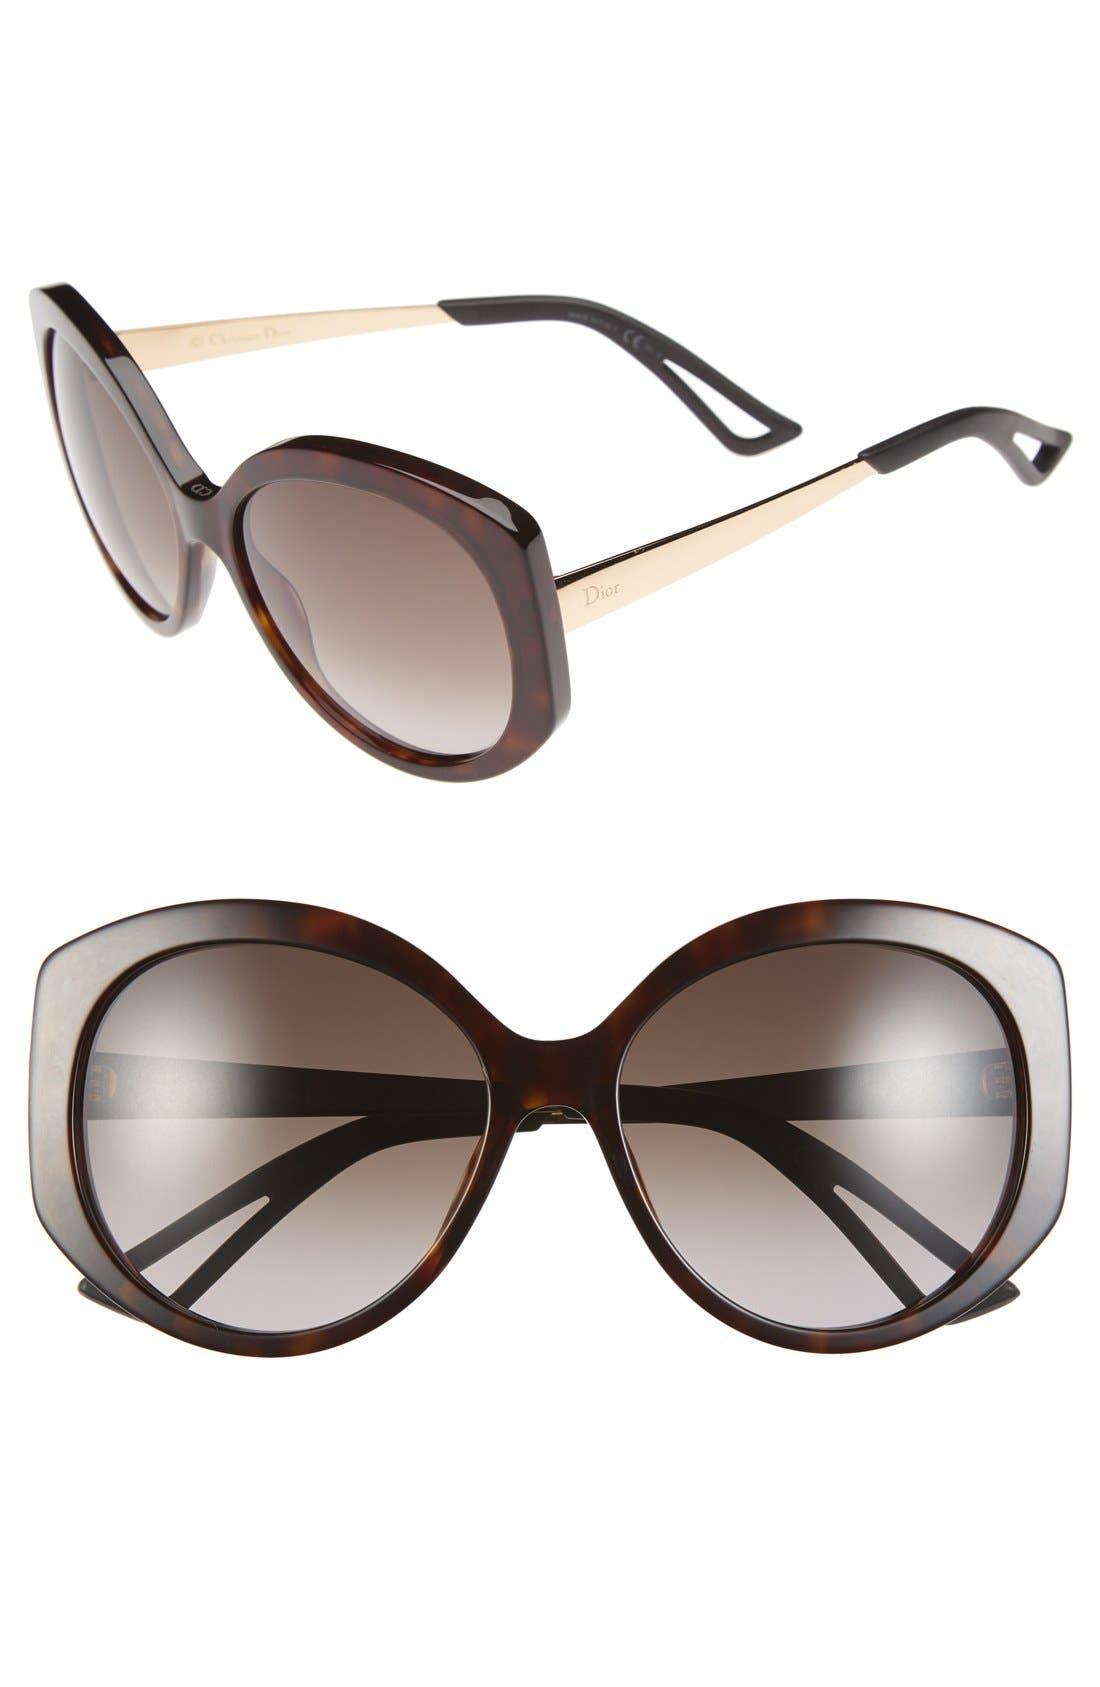 Dior Extase 1 58mm Sunglasses